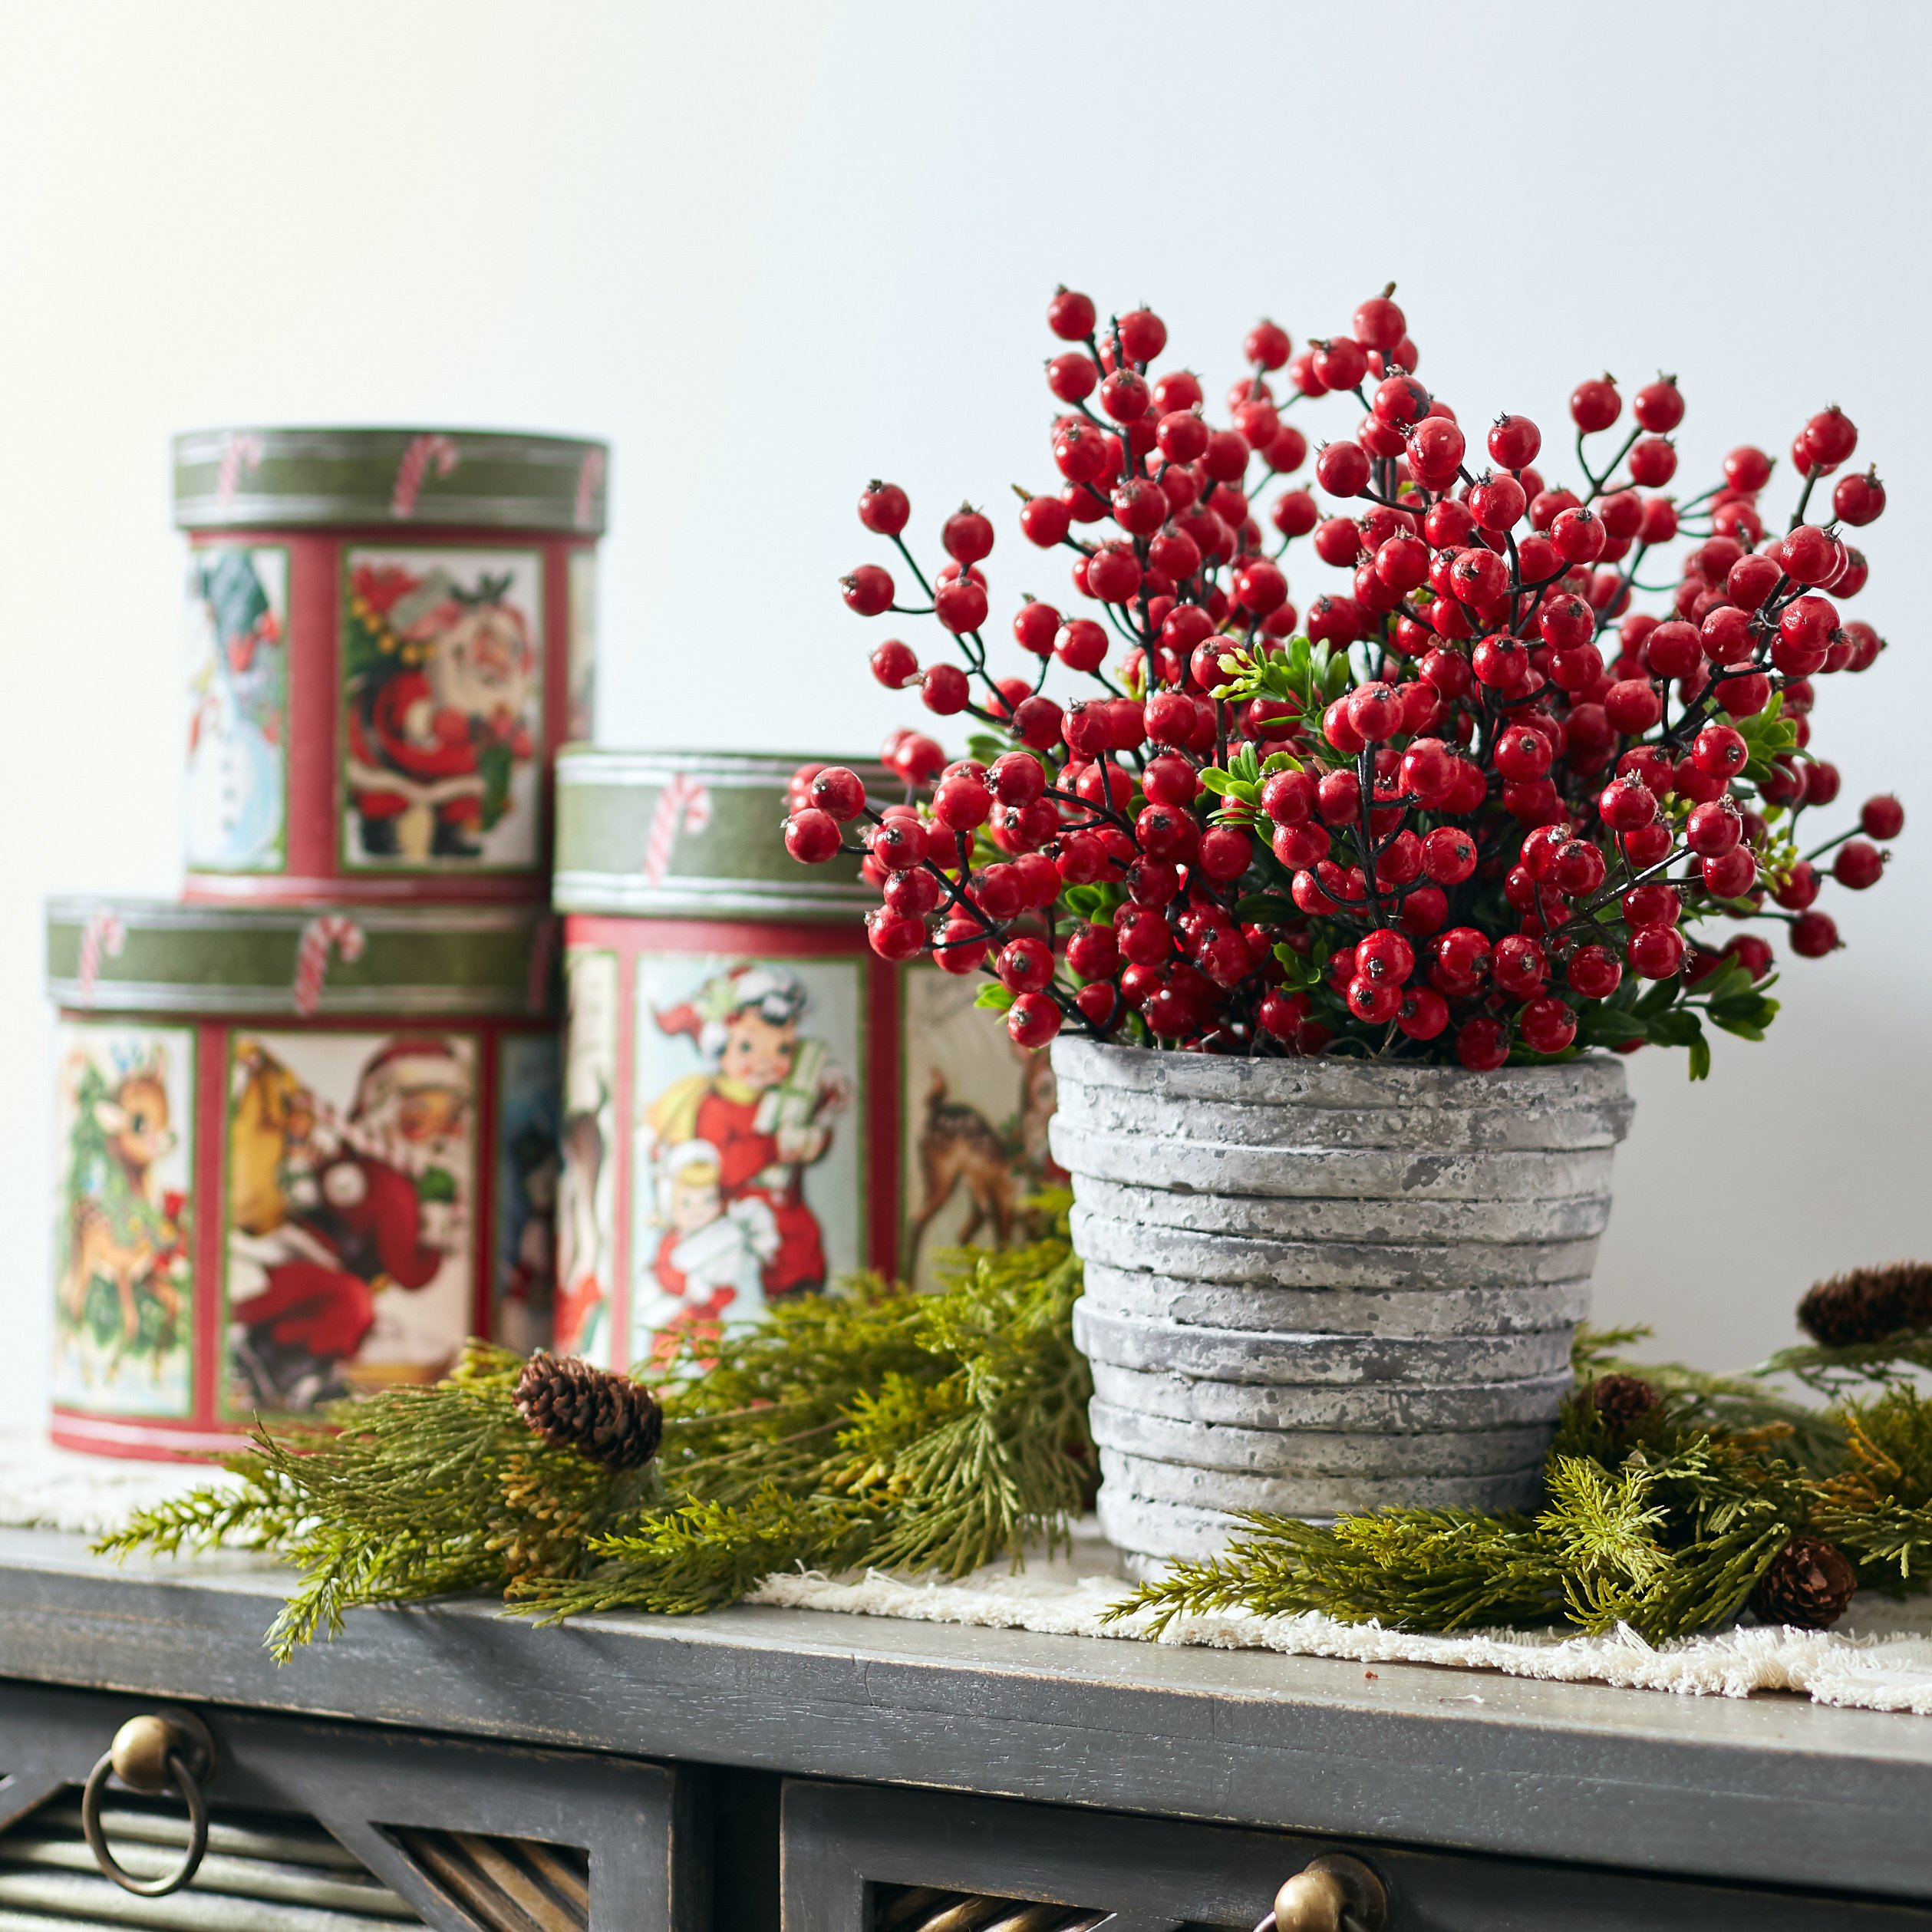 Red Christmas Berries & Boxwood Arrangement in Stoneware Pot